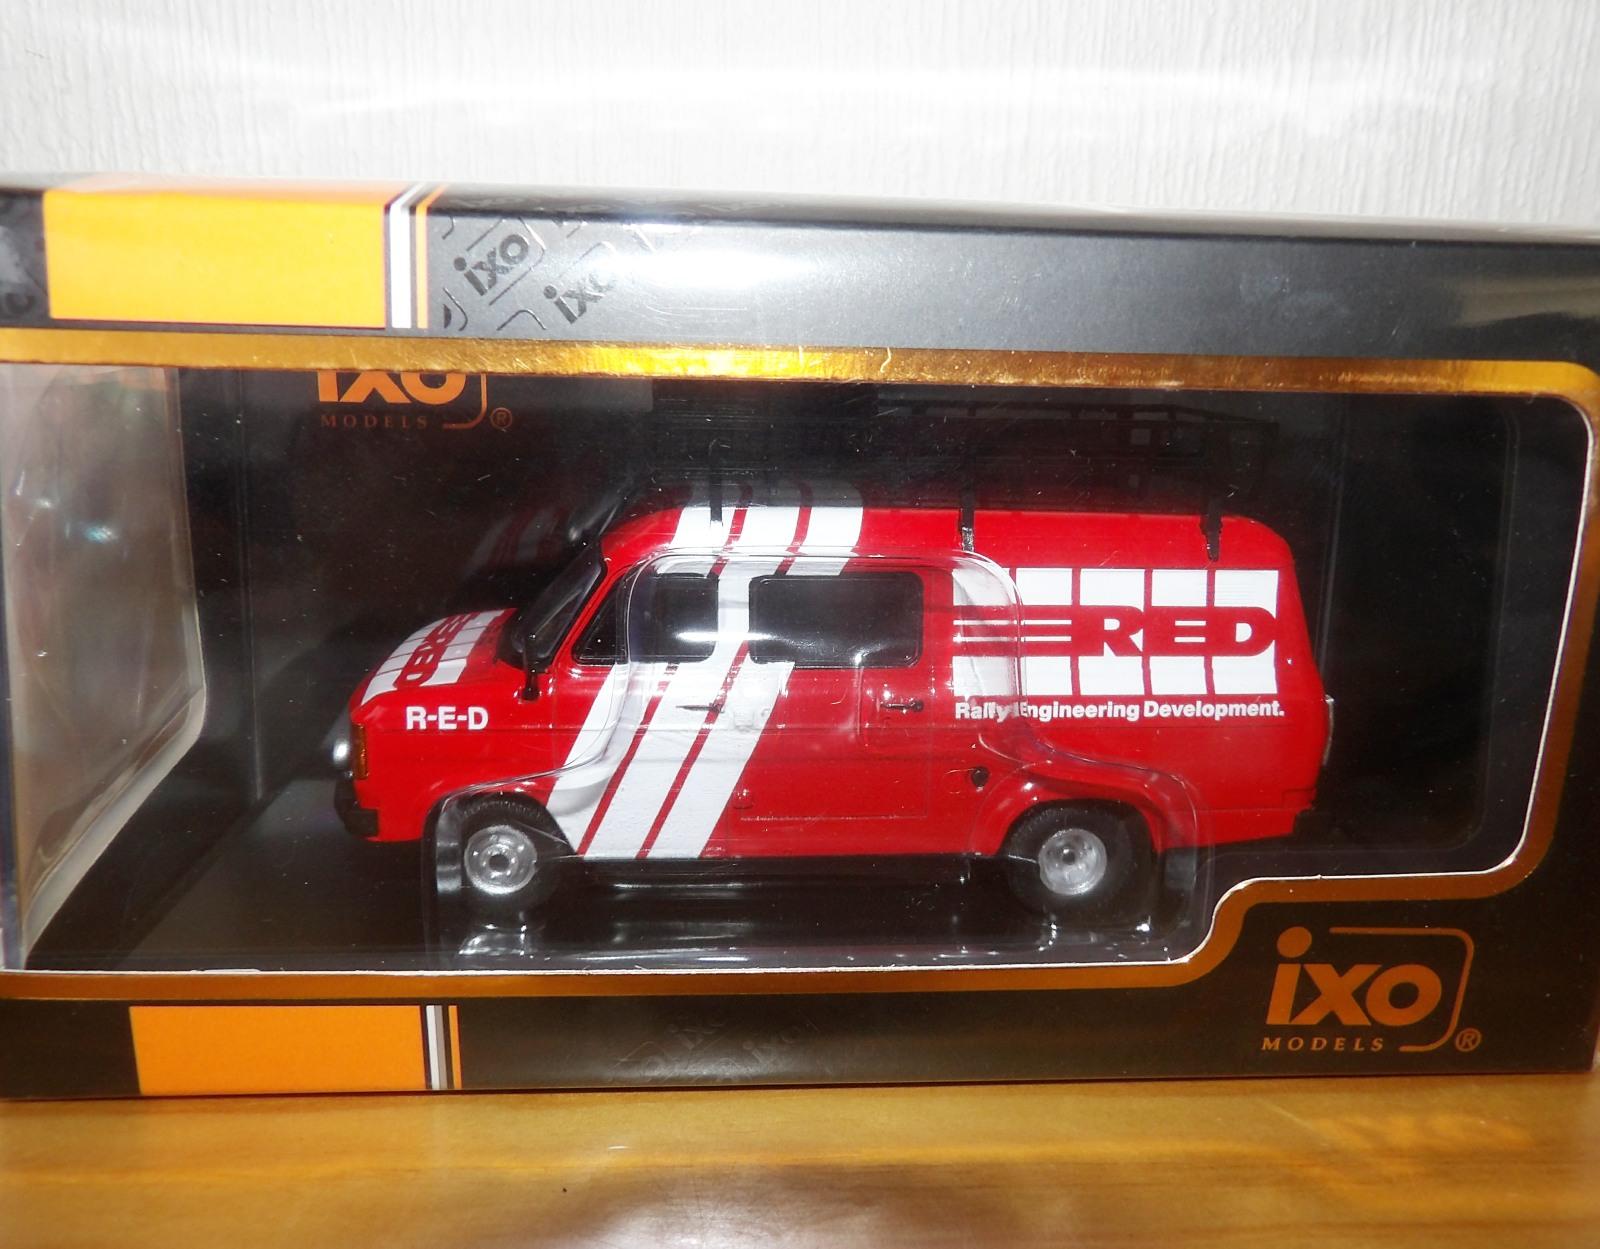 Lot 714 - 1.43 Scale IXO Ford Transit MK11 1985 Rally Engineering Development Van. P&P Group 1 (£14+VAT for